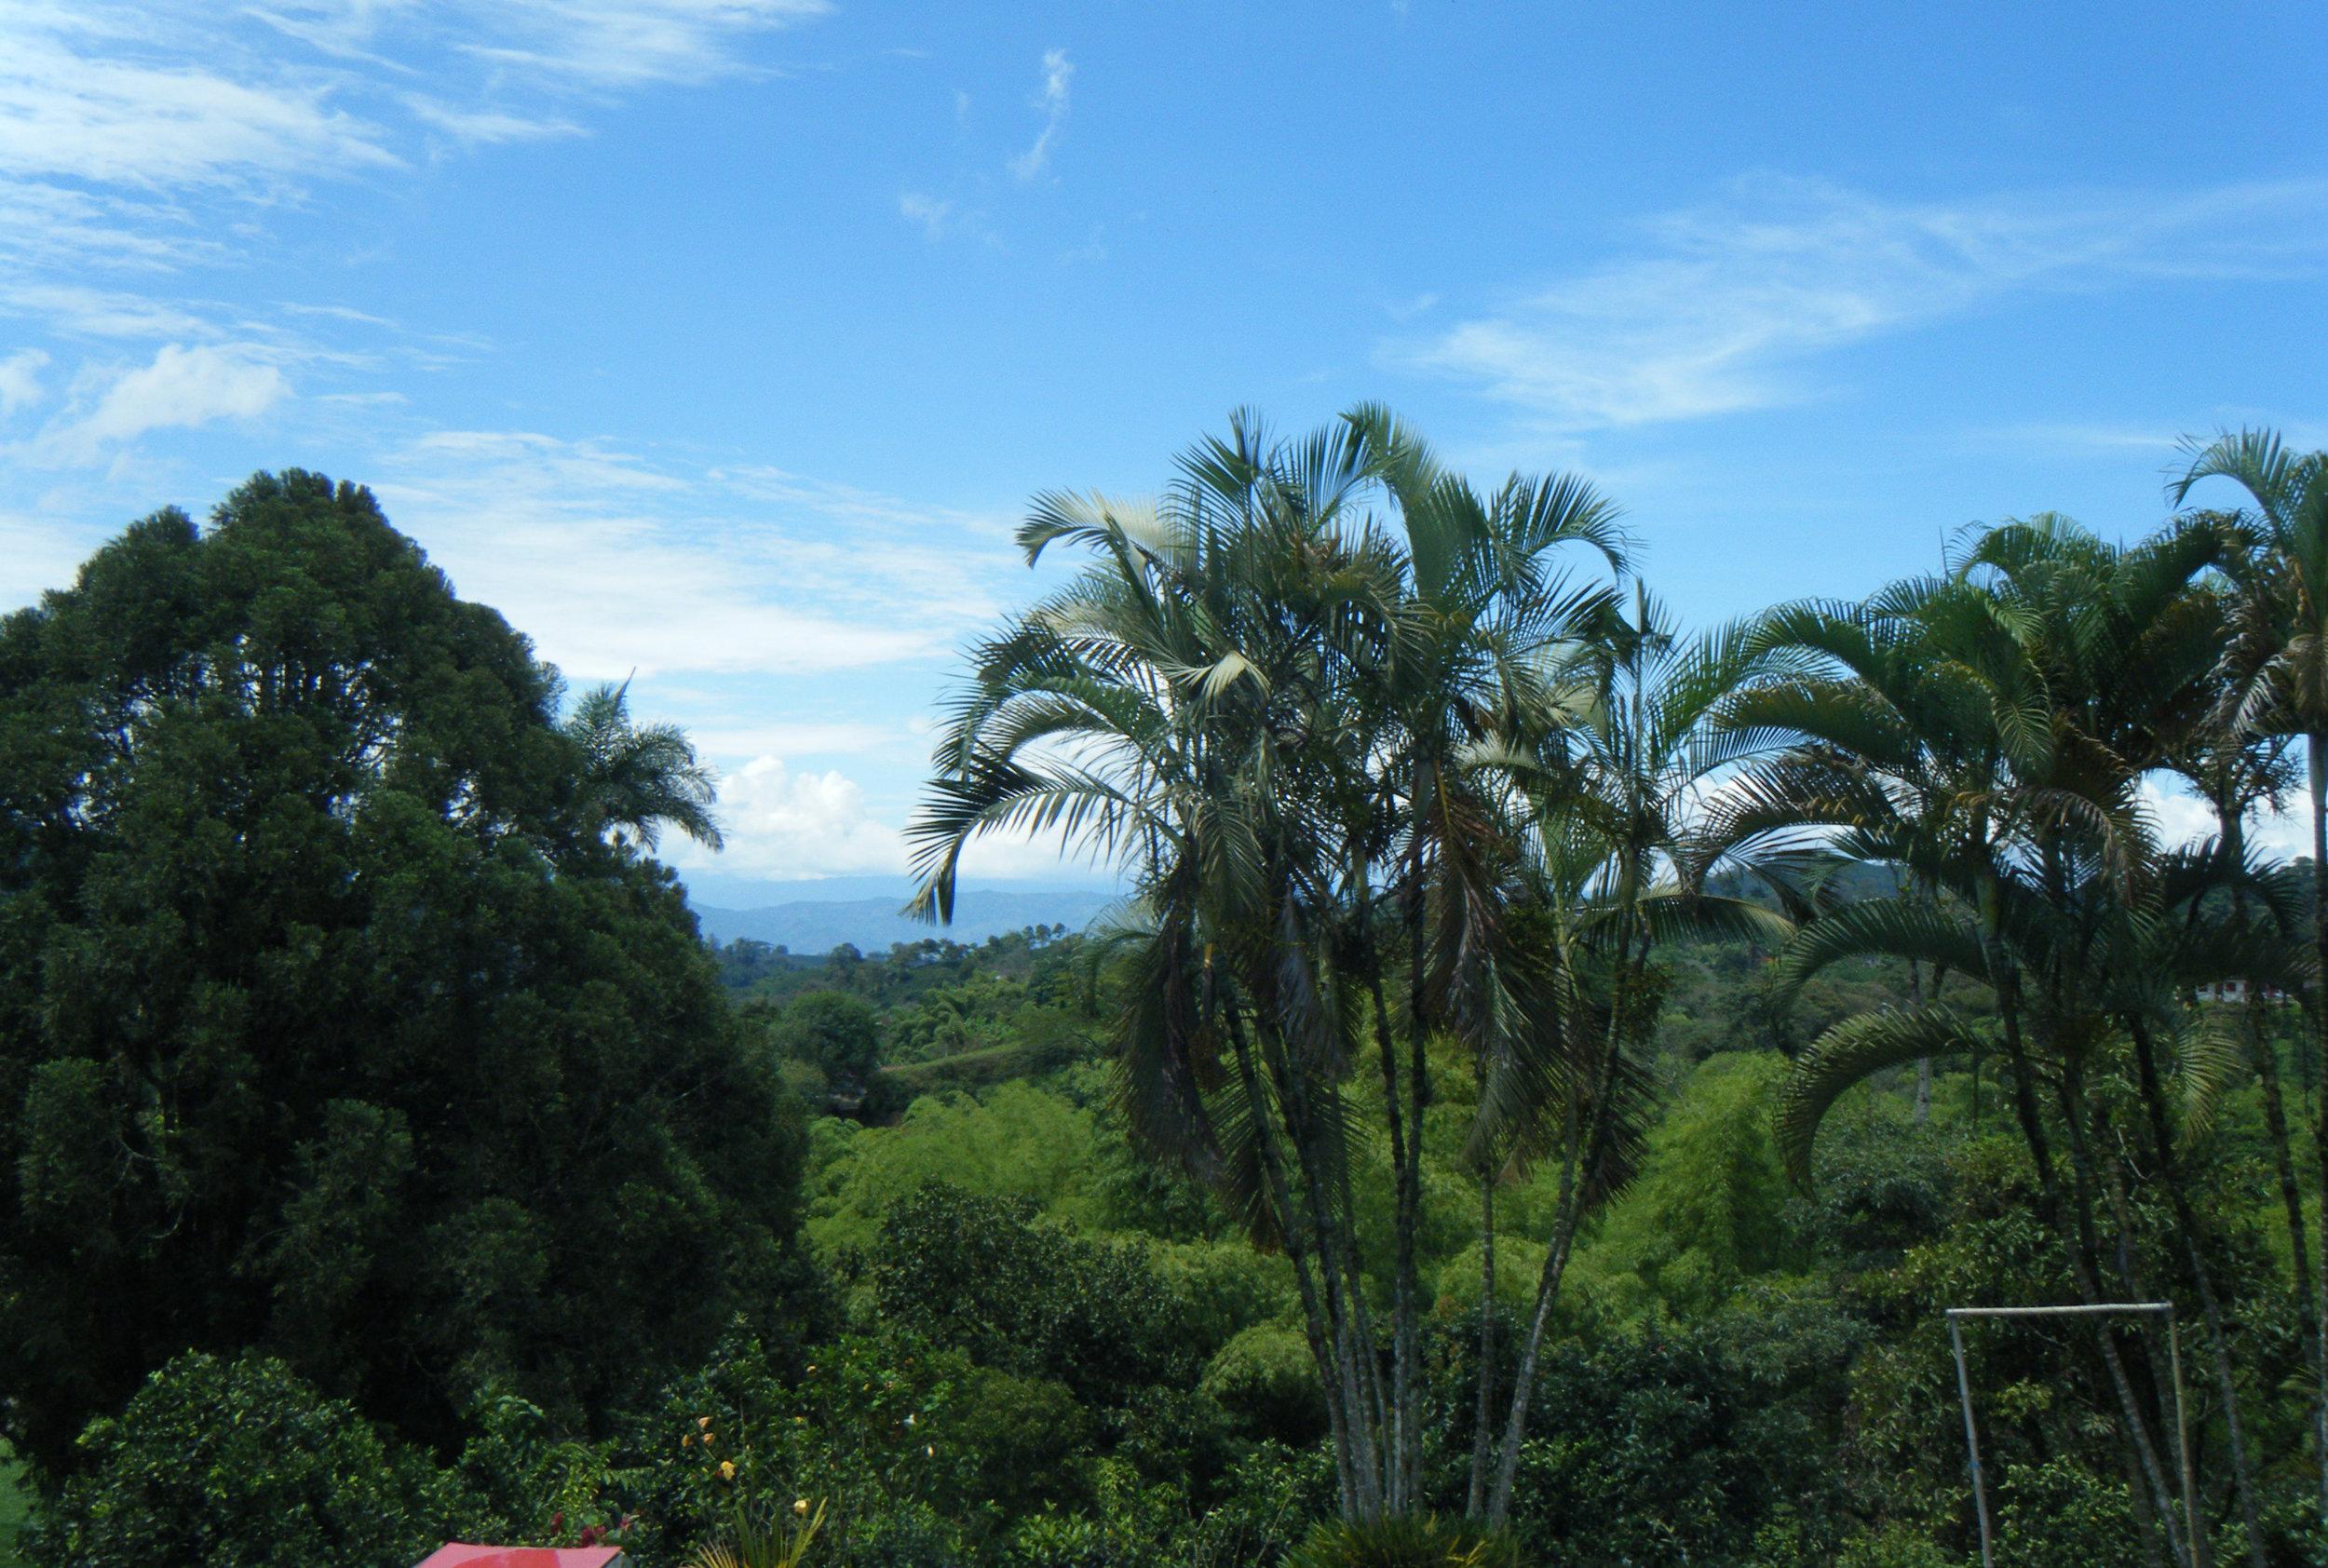 Hacienda Guayabal 10-21-12.jpg